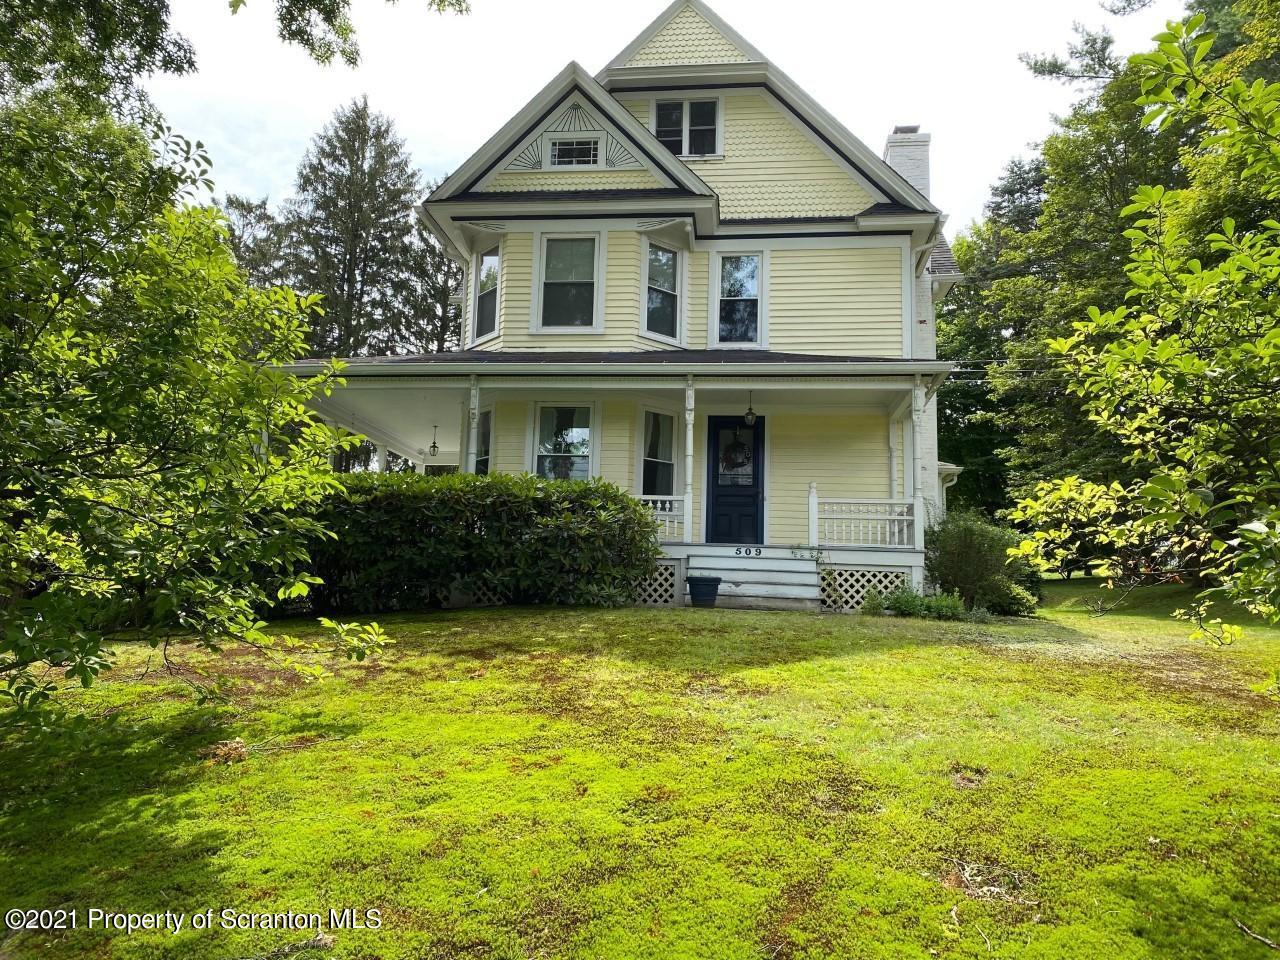 509 Grove St, Clarks Summit, Pennsylvania 18411, 5 Bedrooms Bedrooms, 9 Rooms Rooms,2 BathroomsBathrooms,Single Family,For Sale,Grove,21-3452